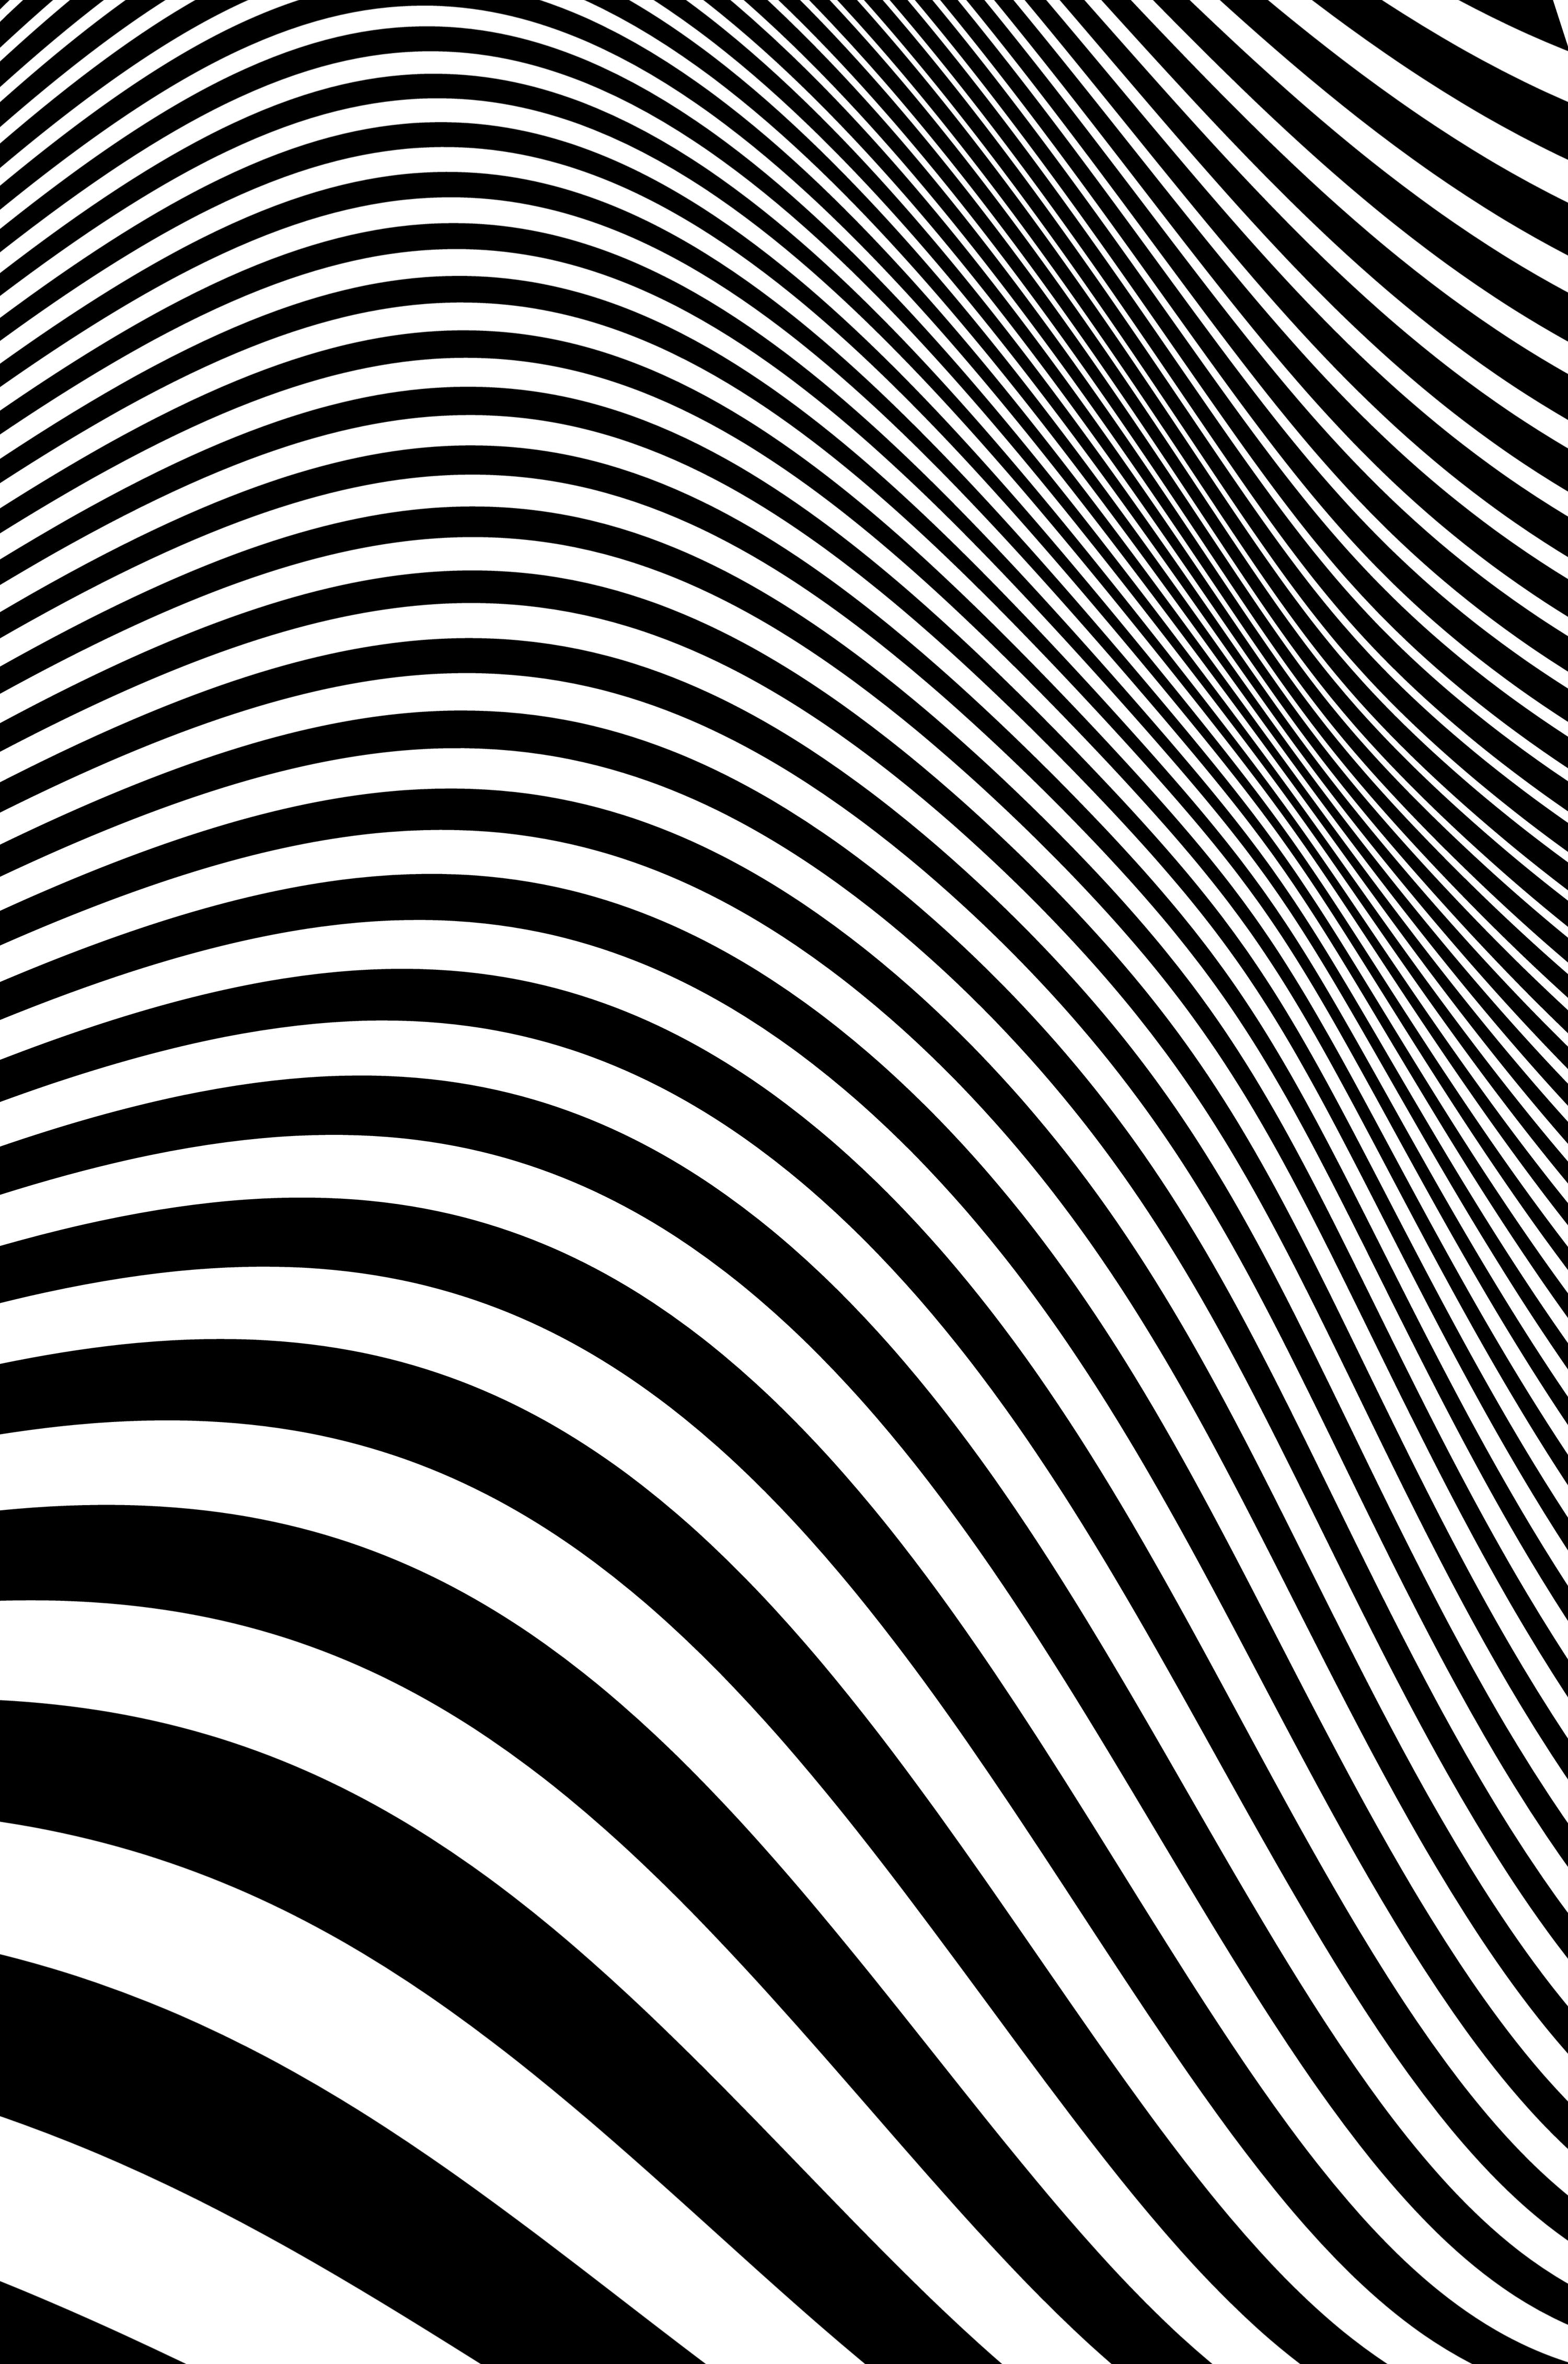 Undulating wave image